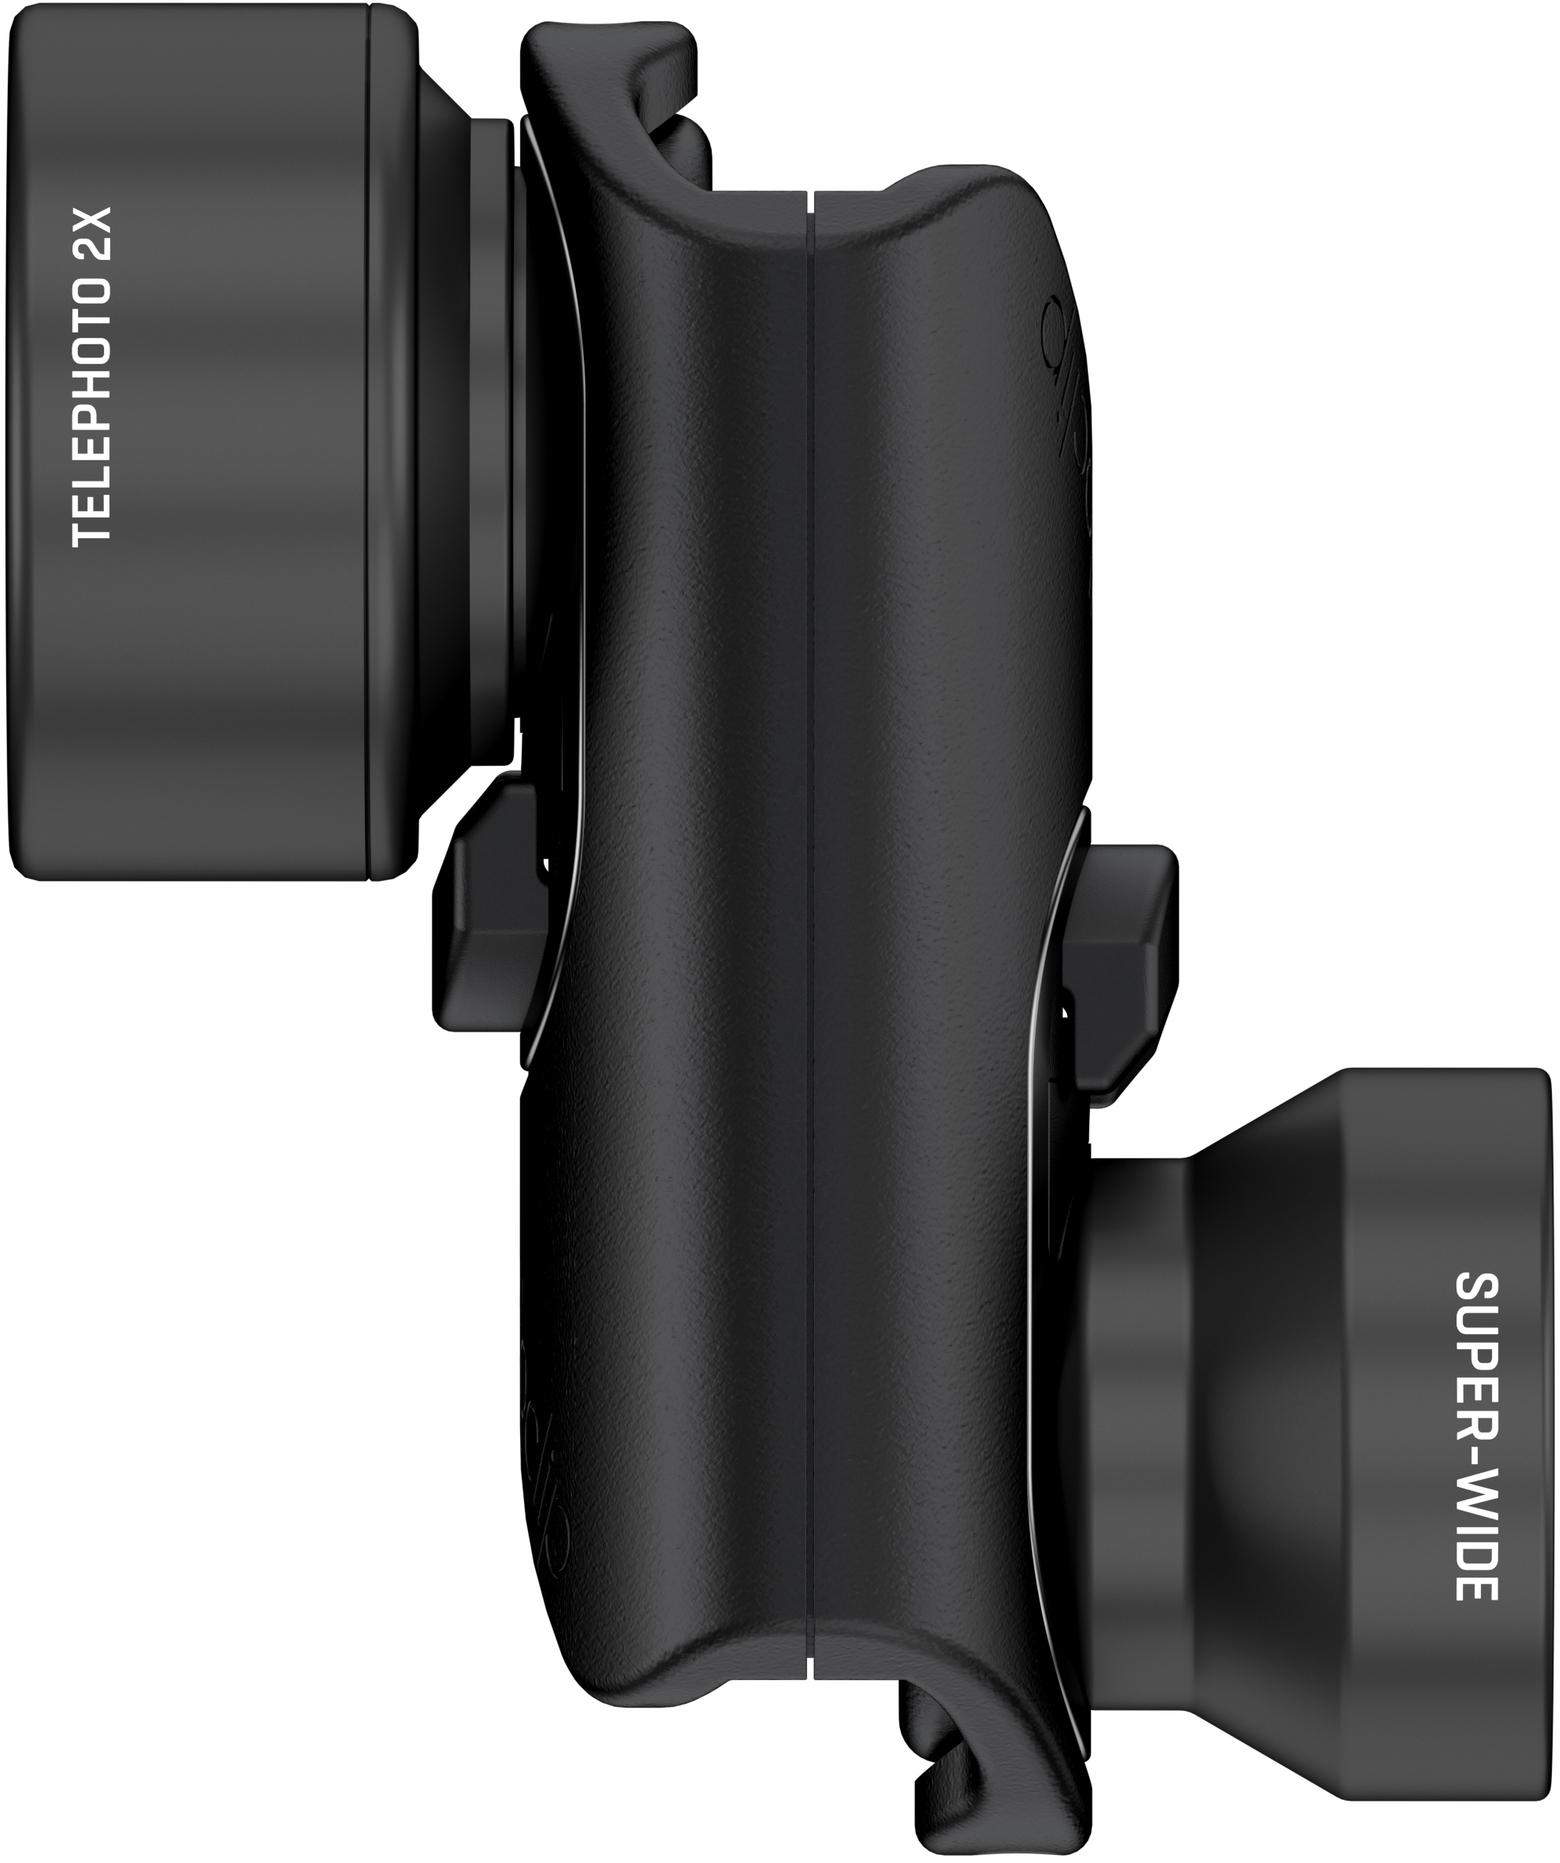 Lens Set